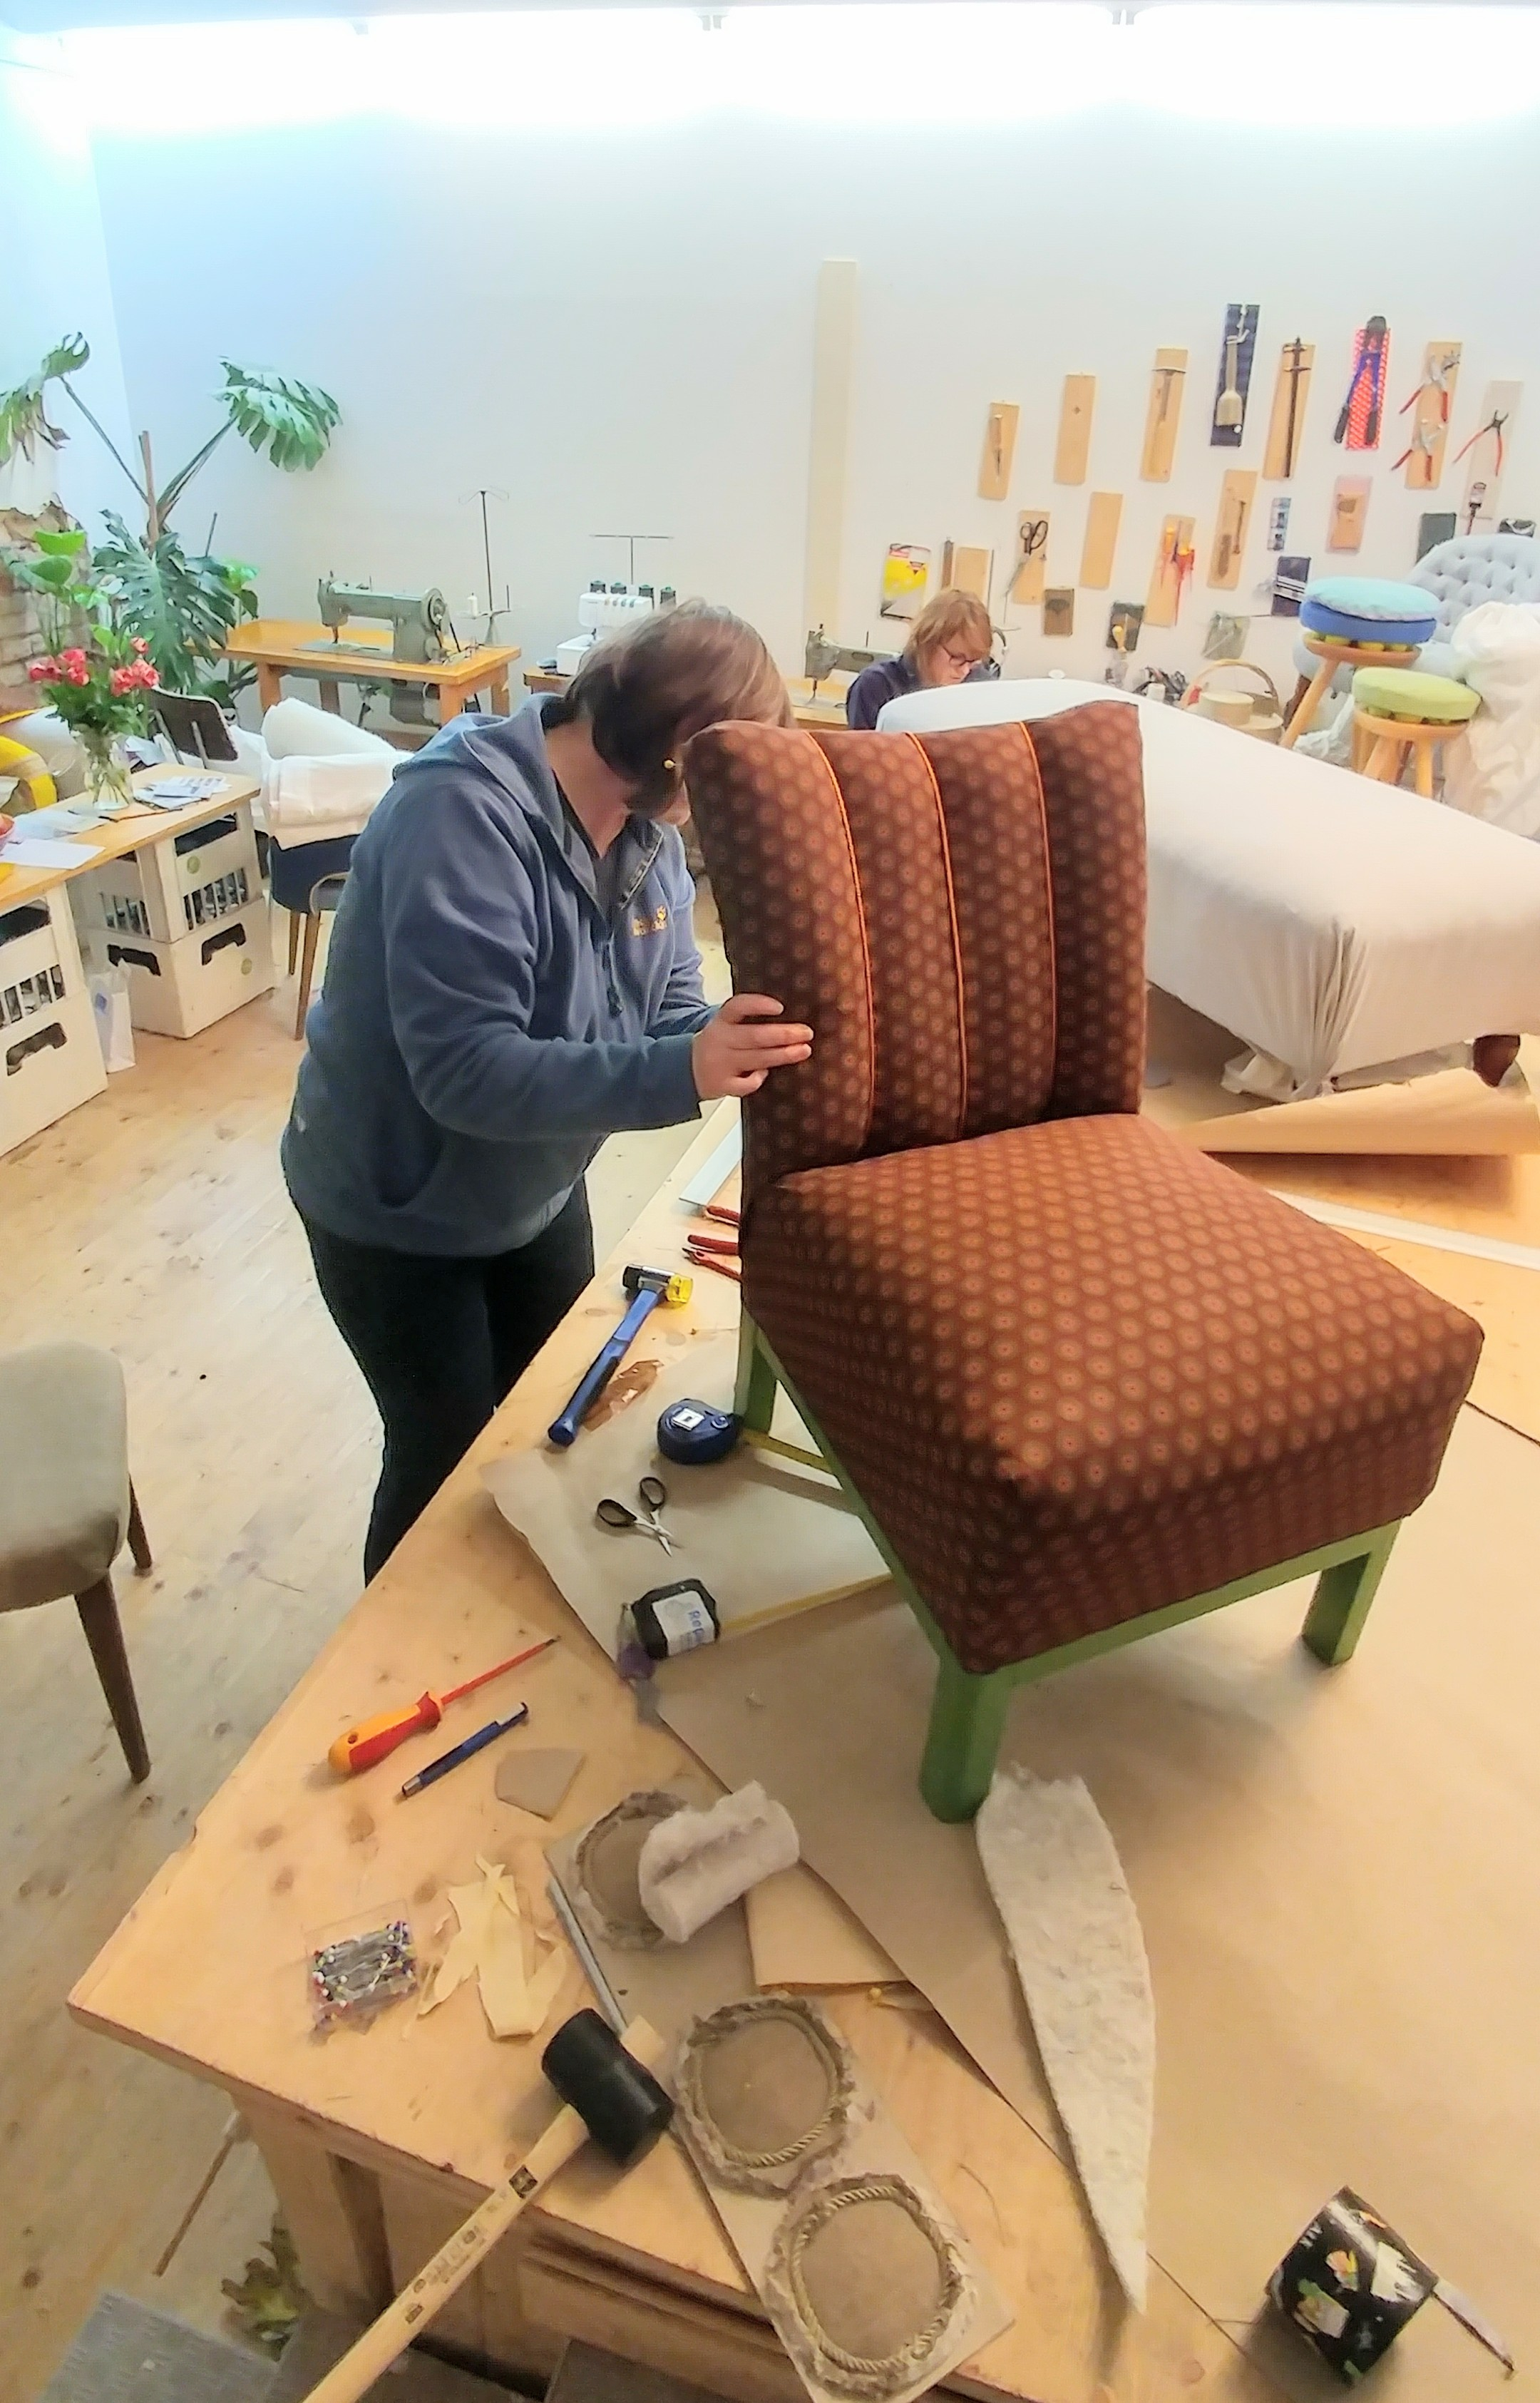 stuhl rckenlehne selbst beziehen simple stuhl rckenlehne selbst beziehen with stuhl rckenlehne. Black Bedroom Furniture Sets. Home Design Ideas